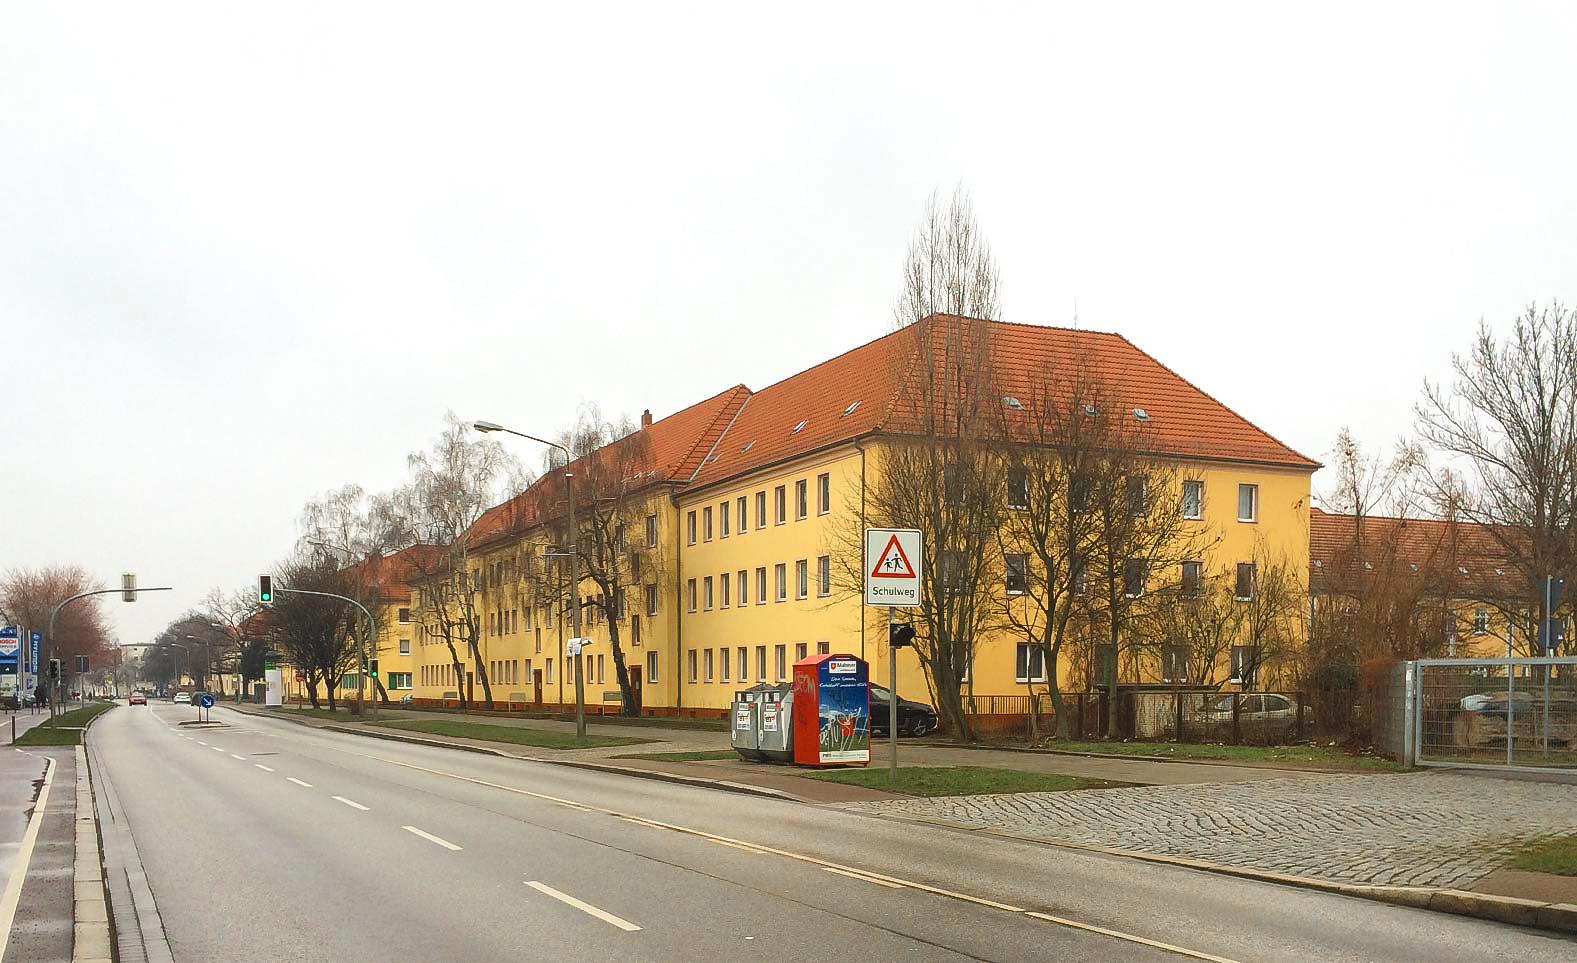 Albert_Vater_Zeitreisen_Magdeburg_Neu